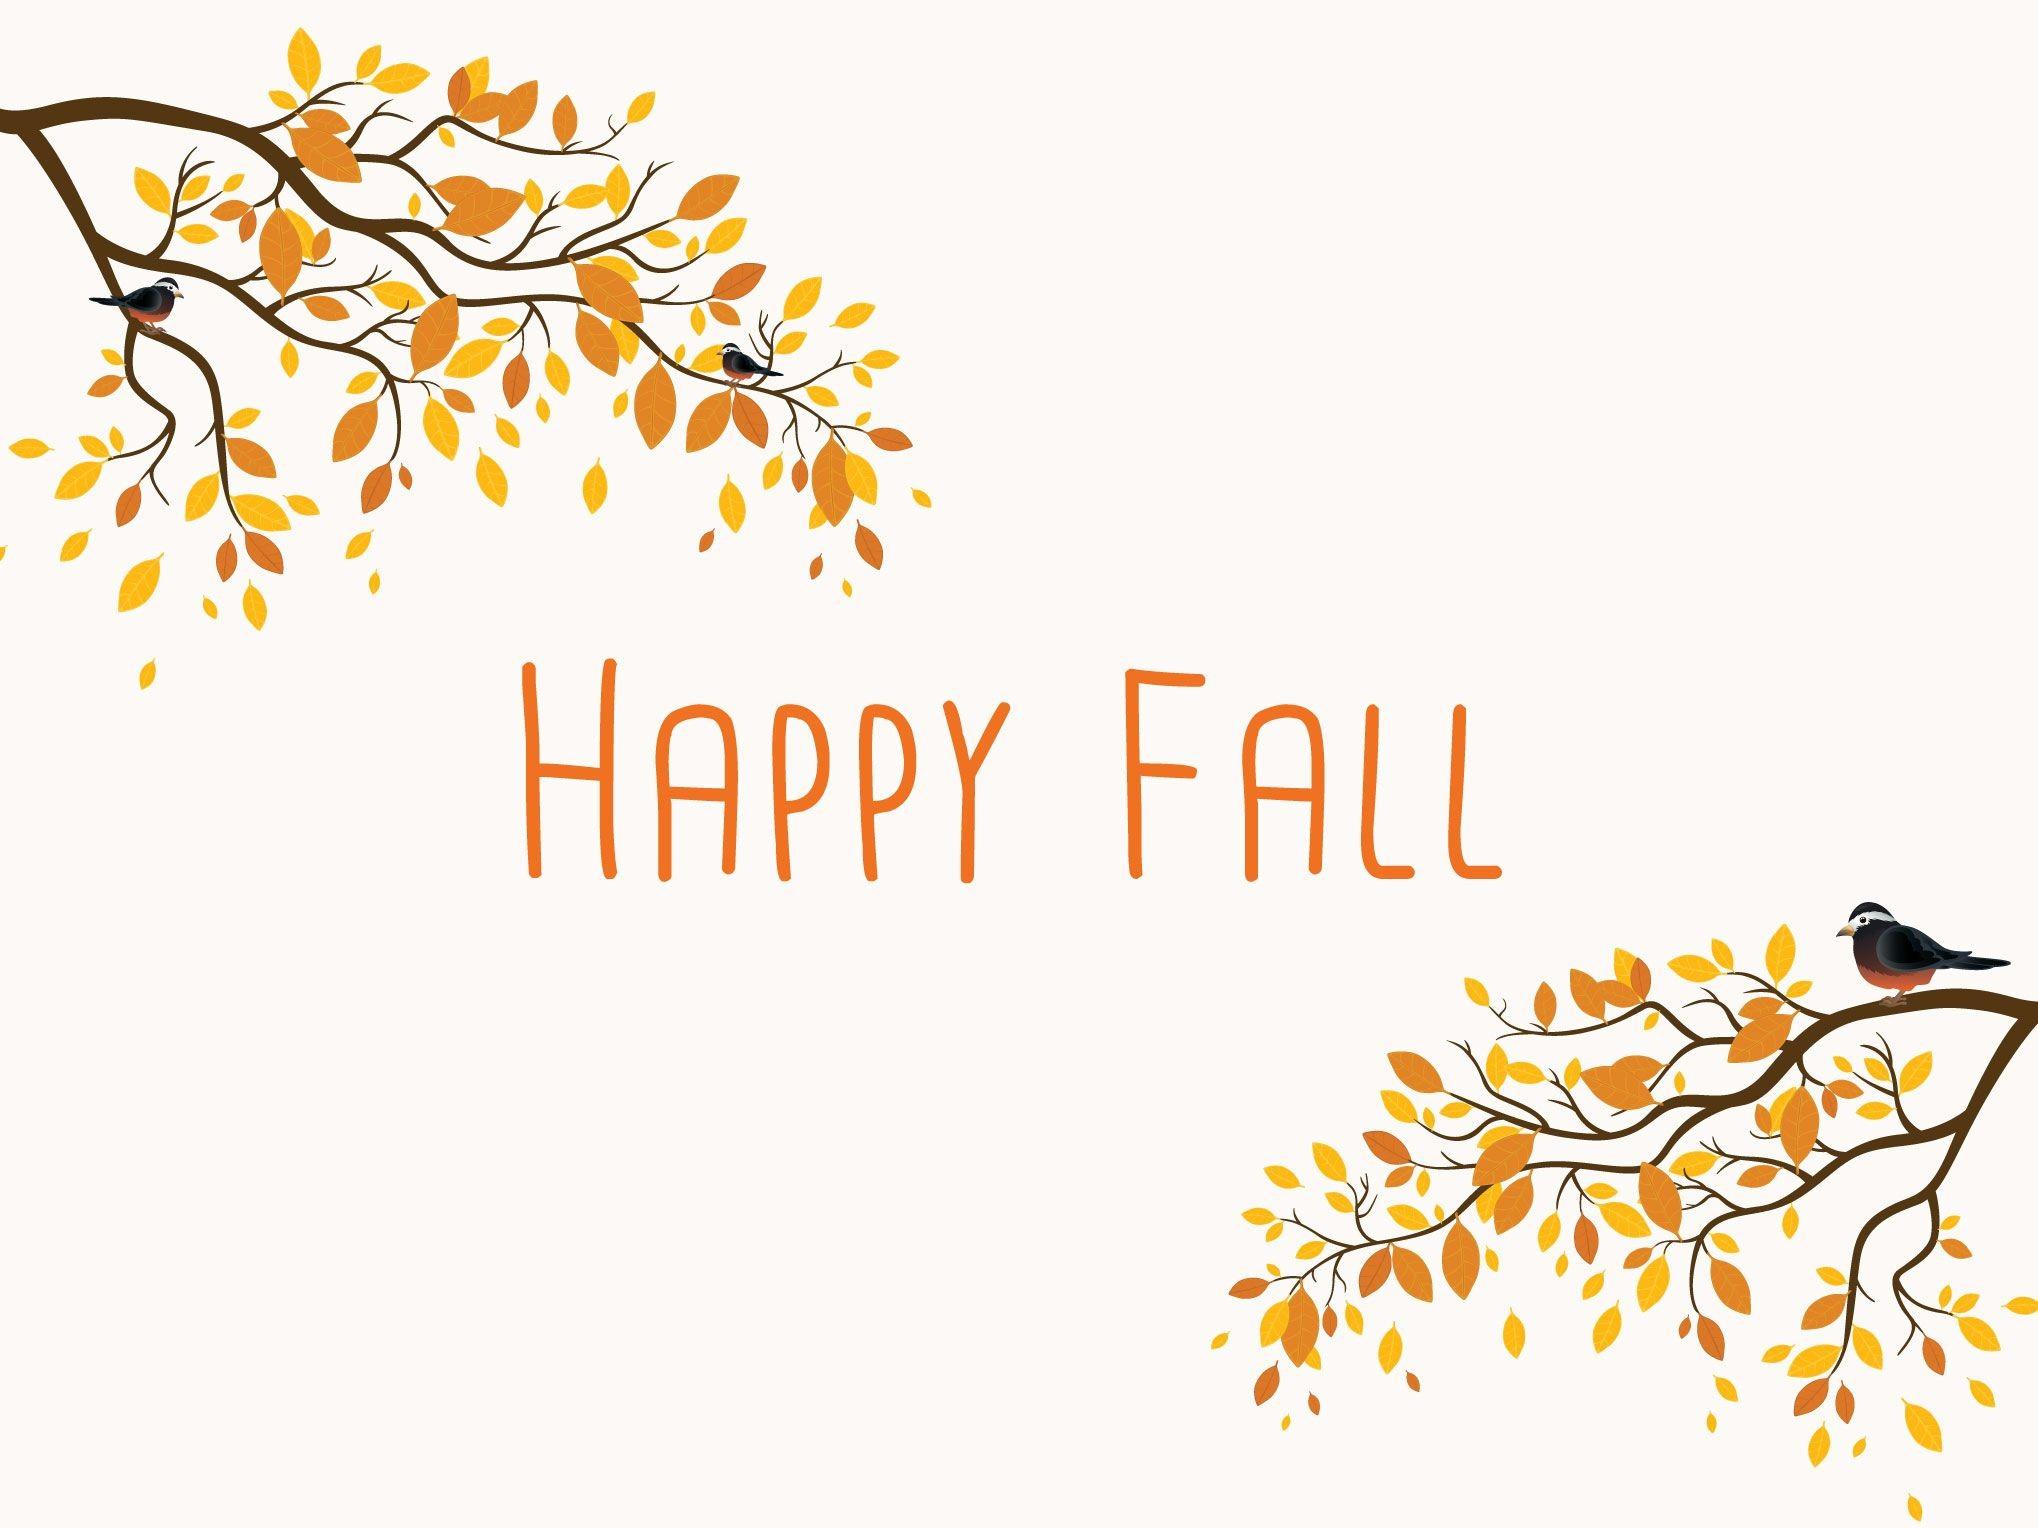 Cute Fall Wallpaper For Desktop - Wall